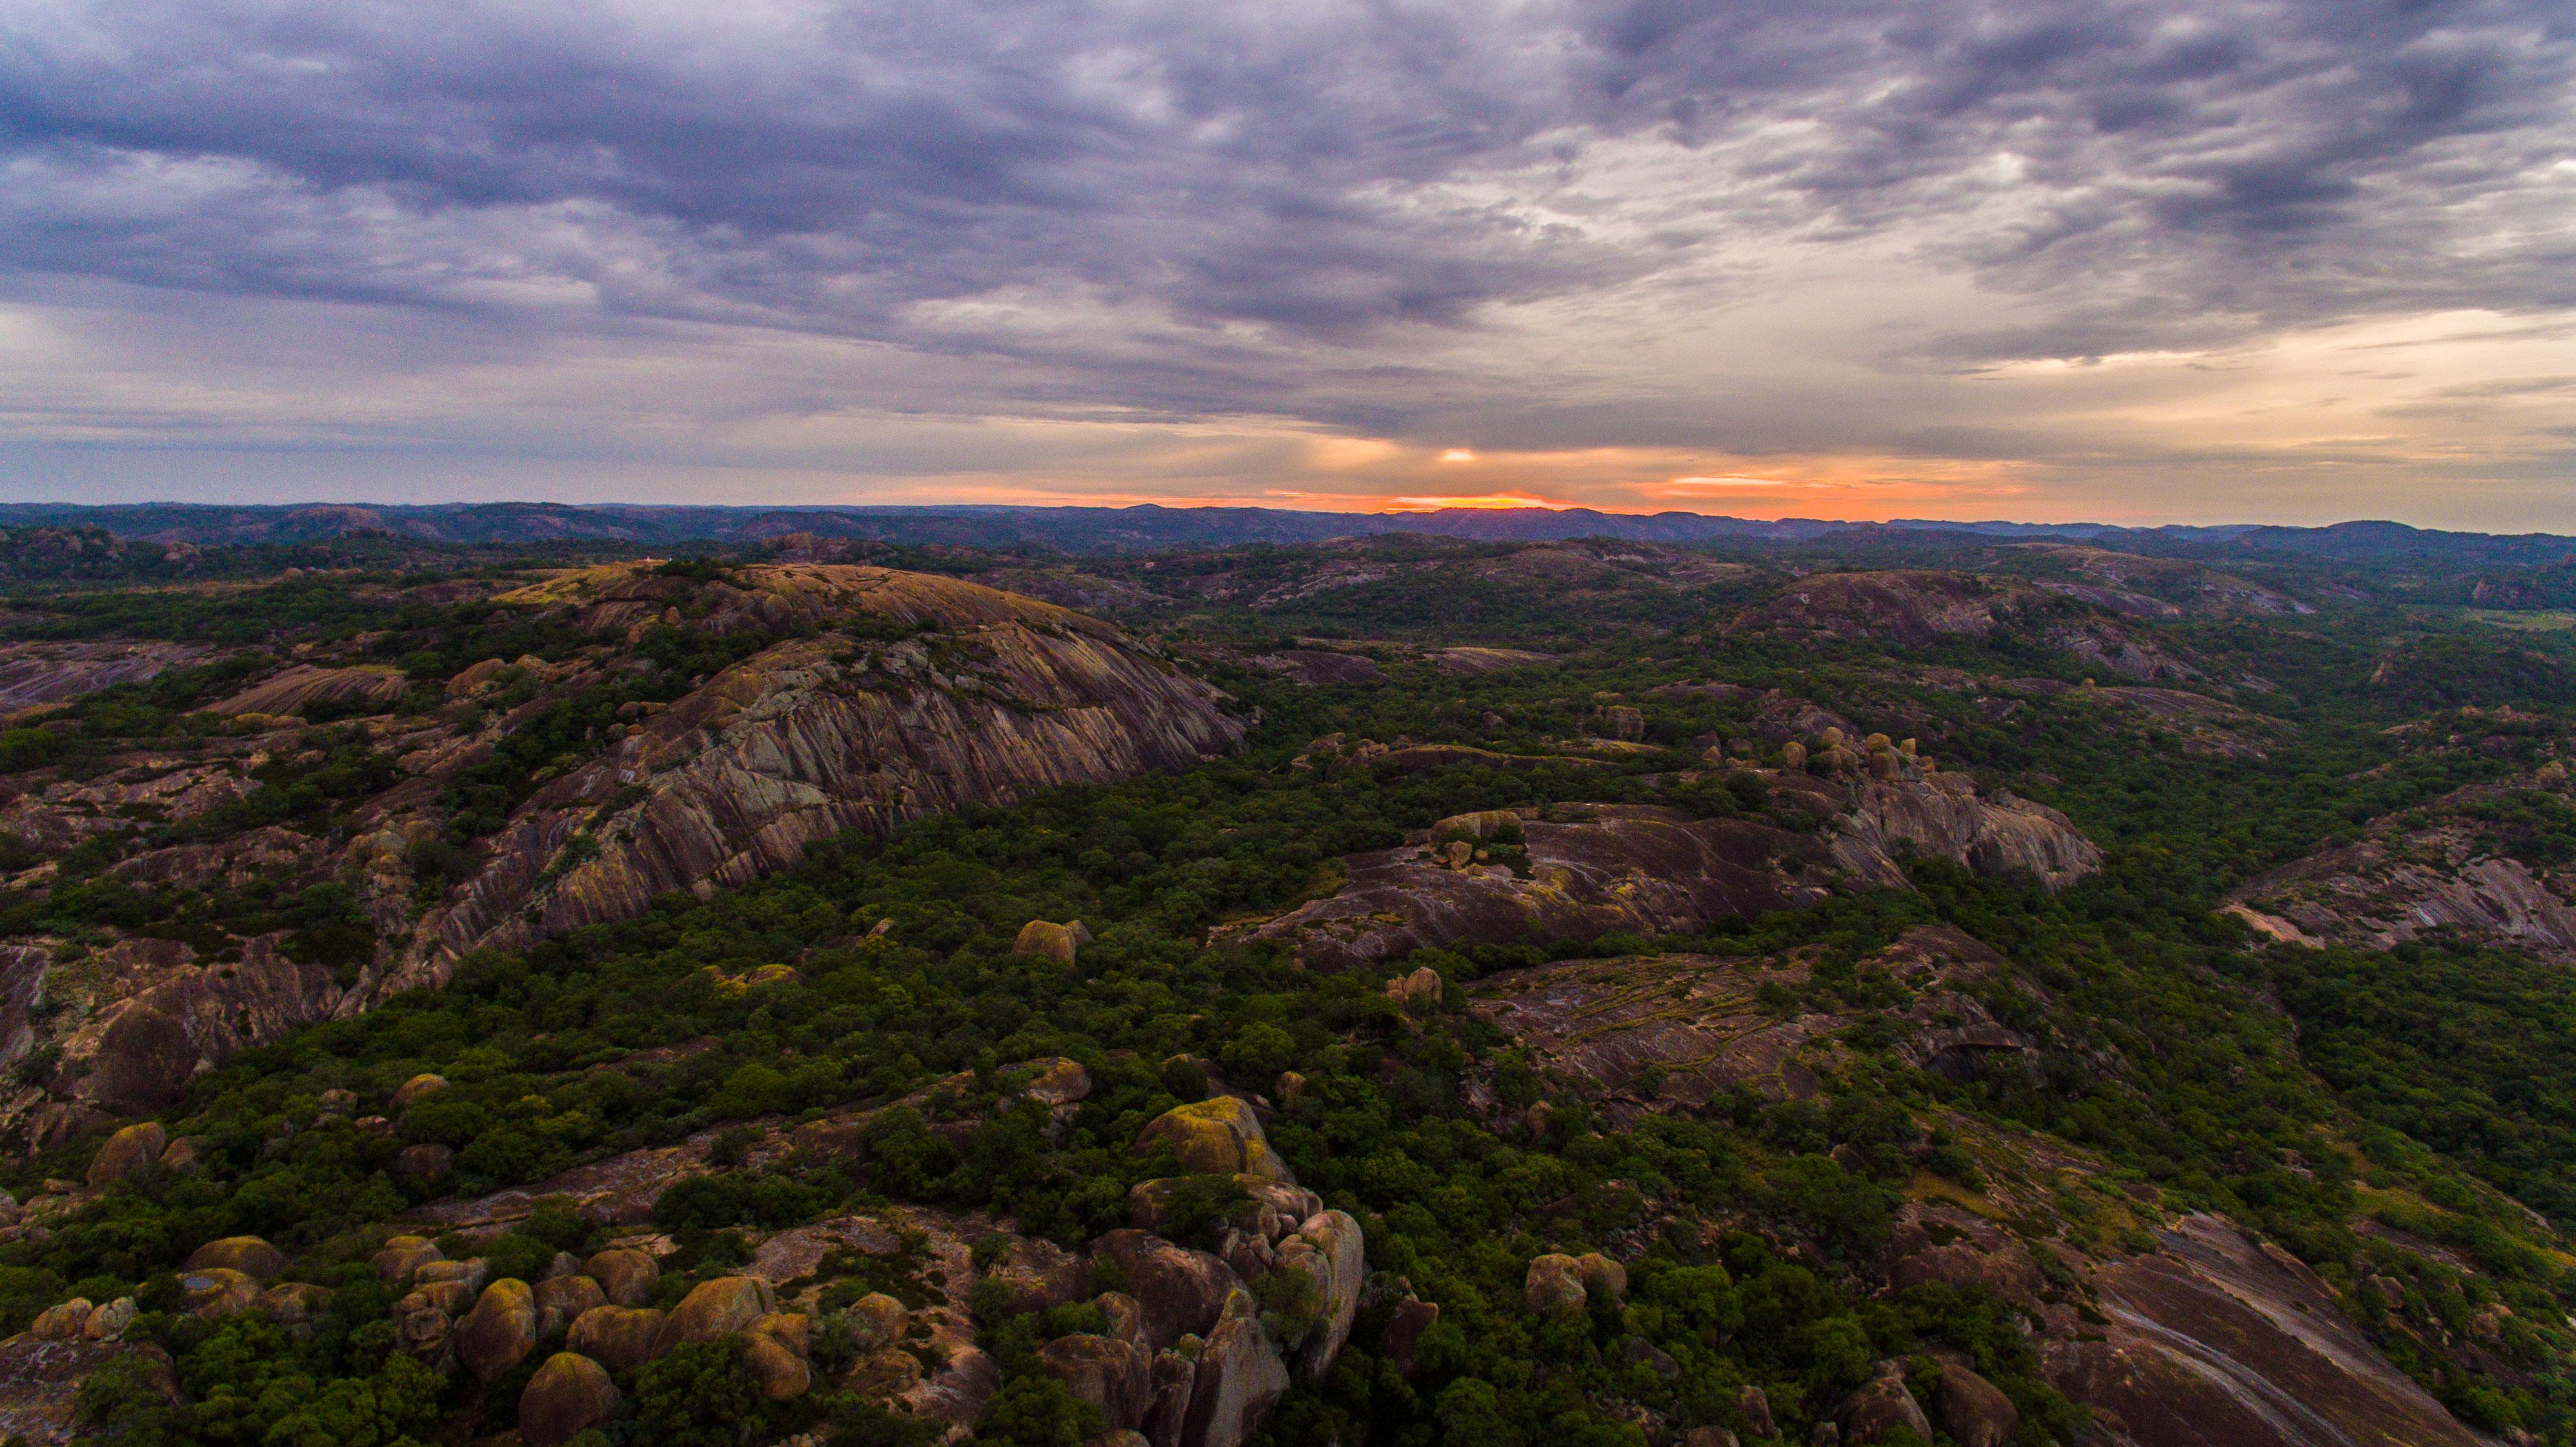 Matobo Hills Sunrise